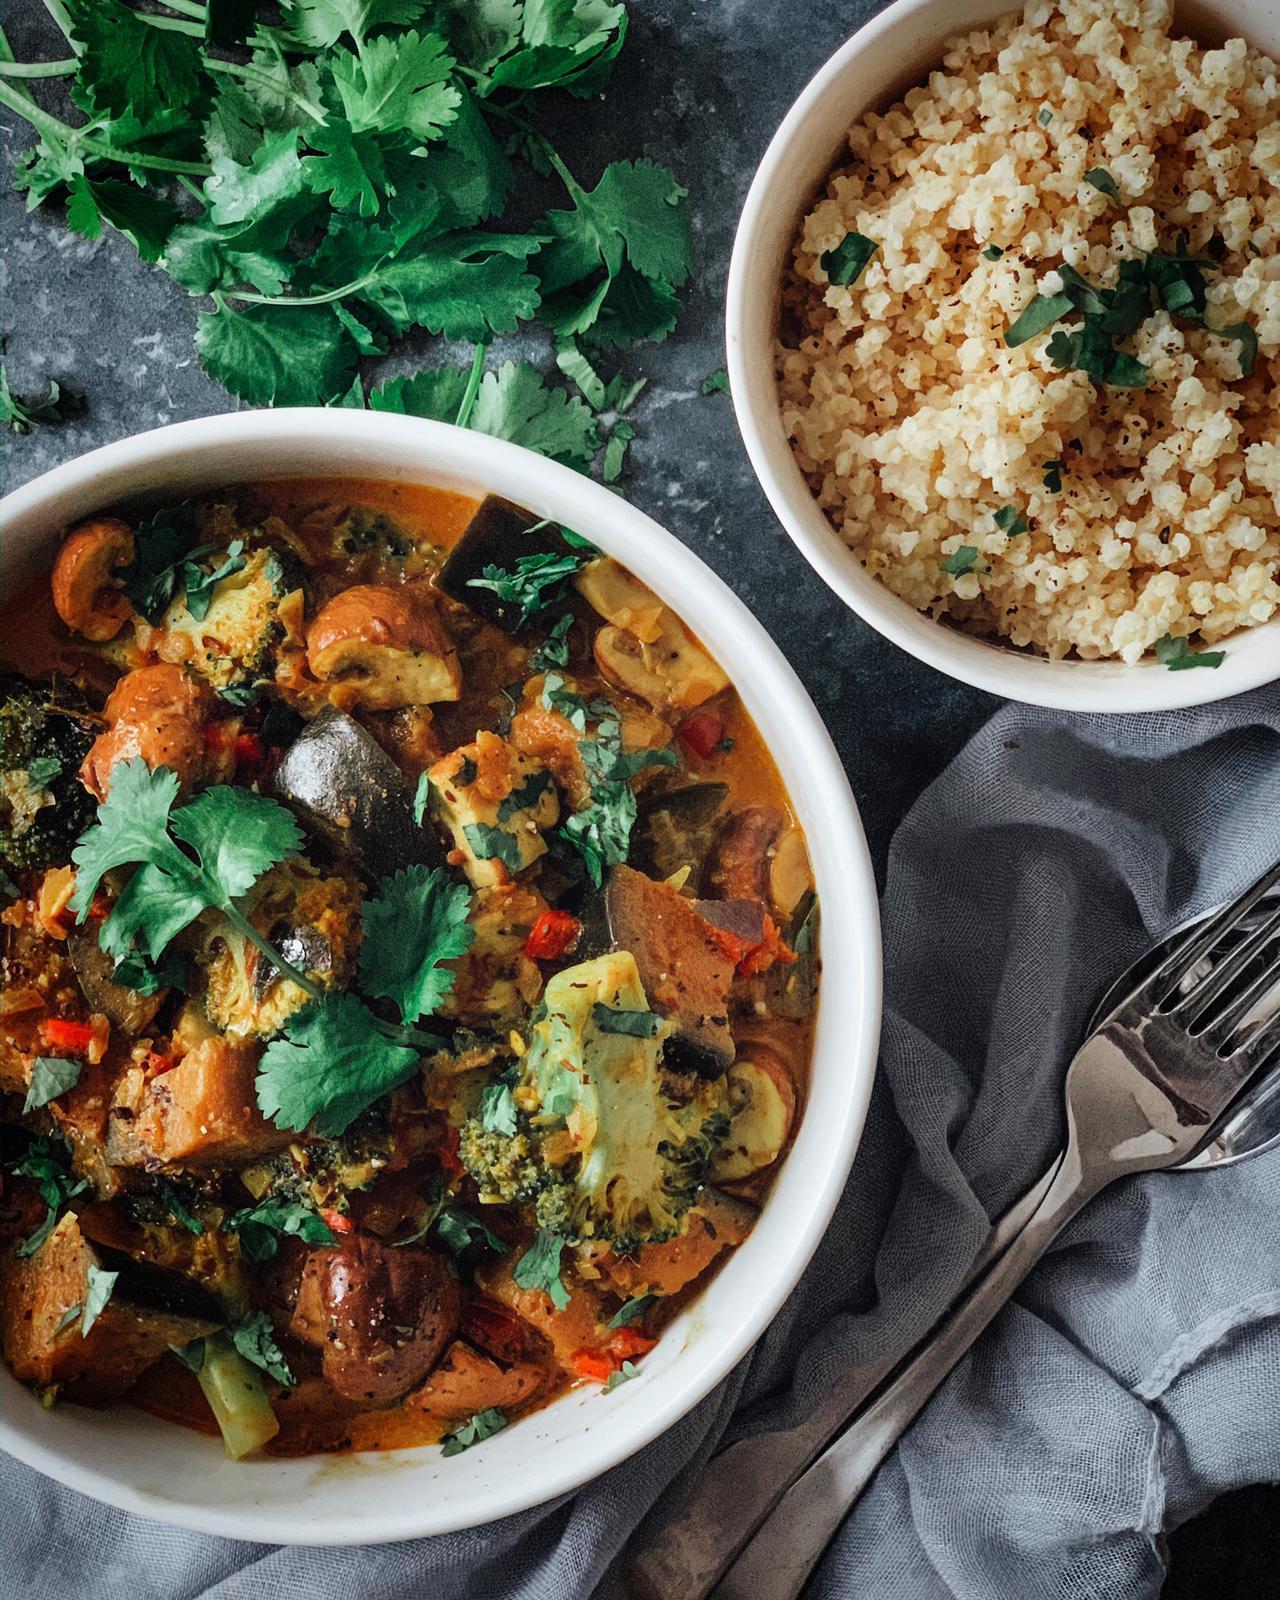 Aubergine, Mushroom & Broccoli Curry with Millet